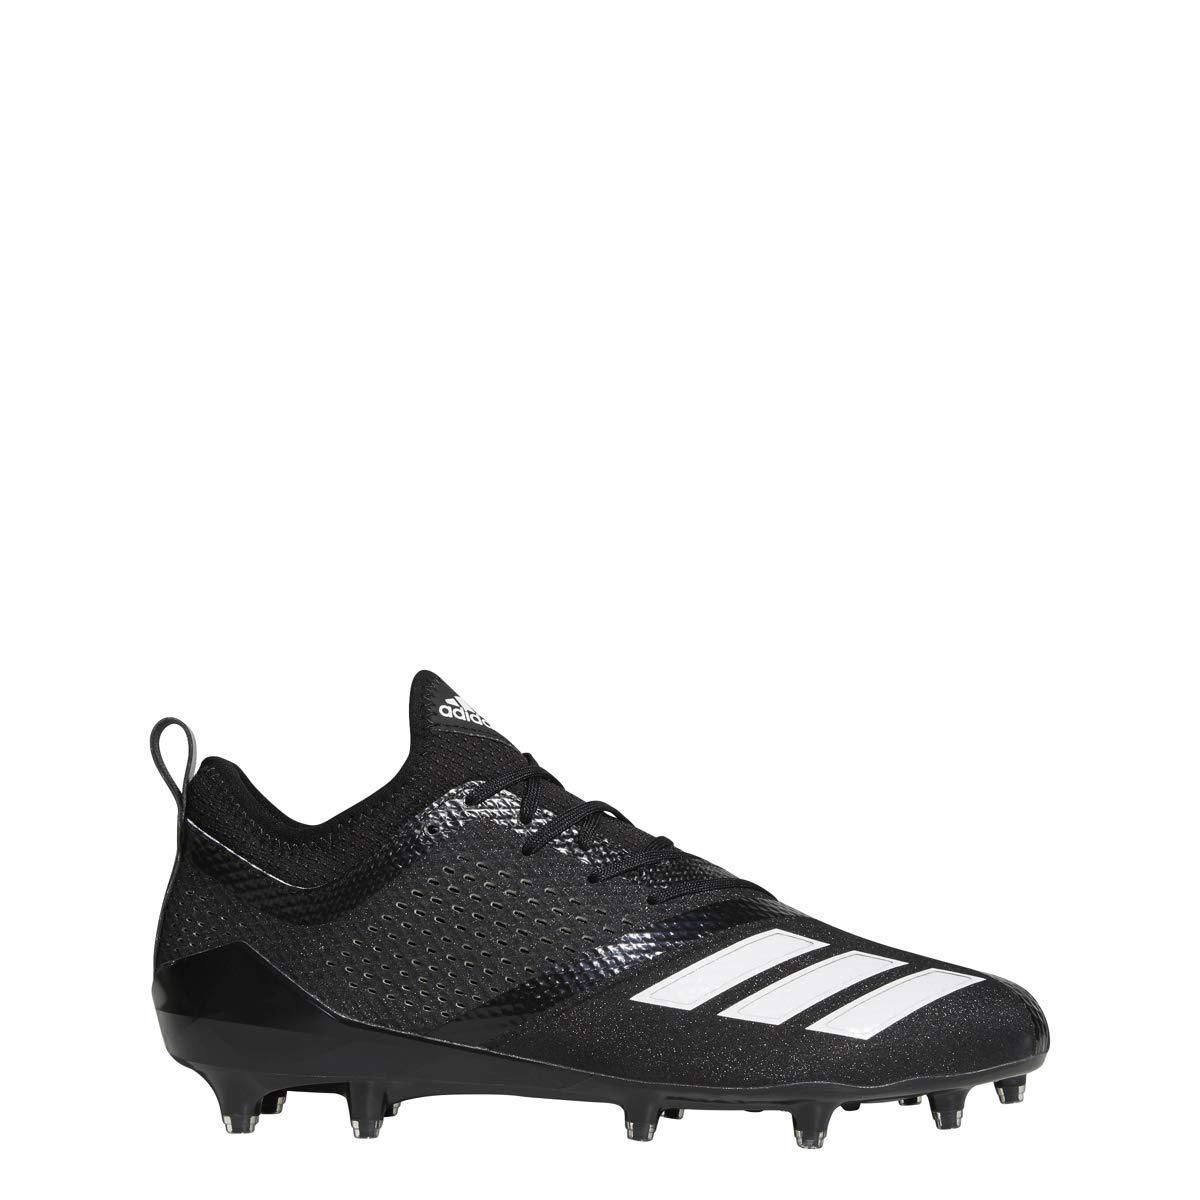 29a051bf3fd adidas Adizero 5-Star 7.0 Cleat - Men s Football Black product image